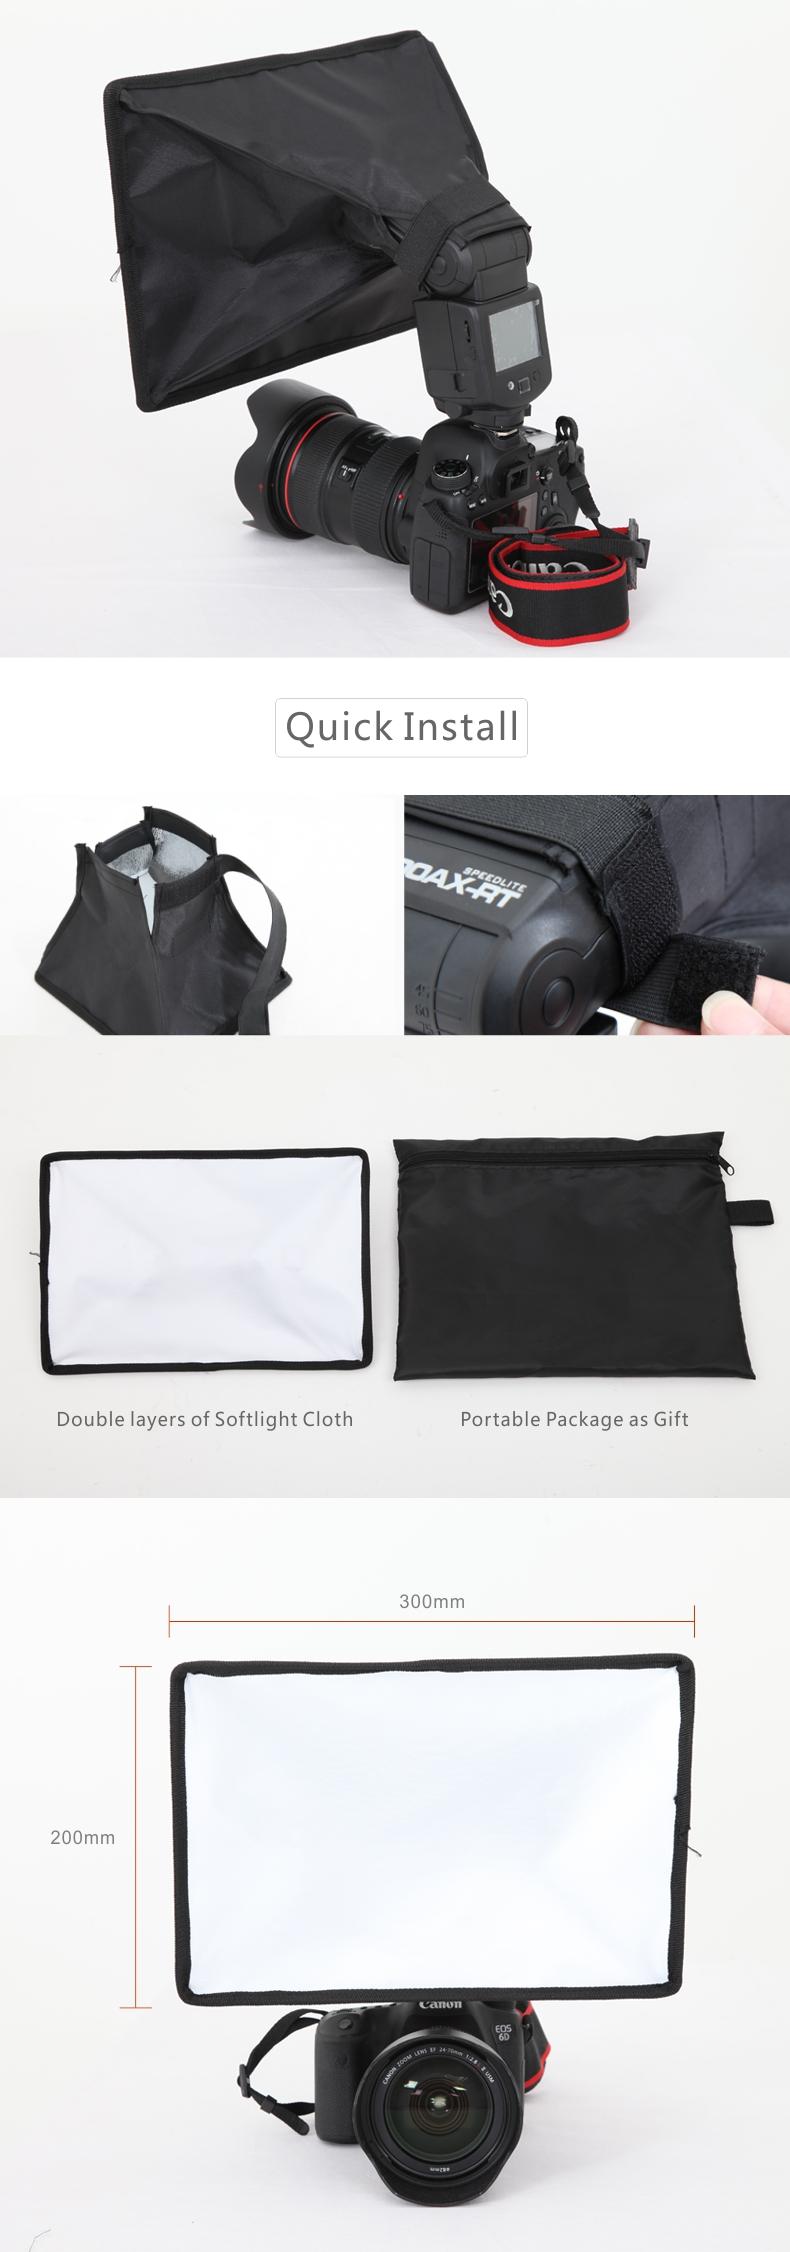 Falconeyes ESB2030 Portable Foldable Flash Diffuser Softbox for Canon Nikon Sony DSLR flash Speedlite Photo Studio Accessories 9